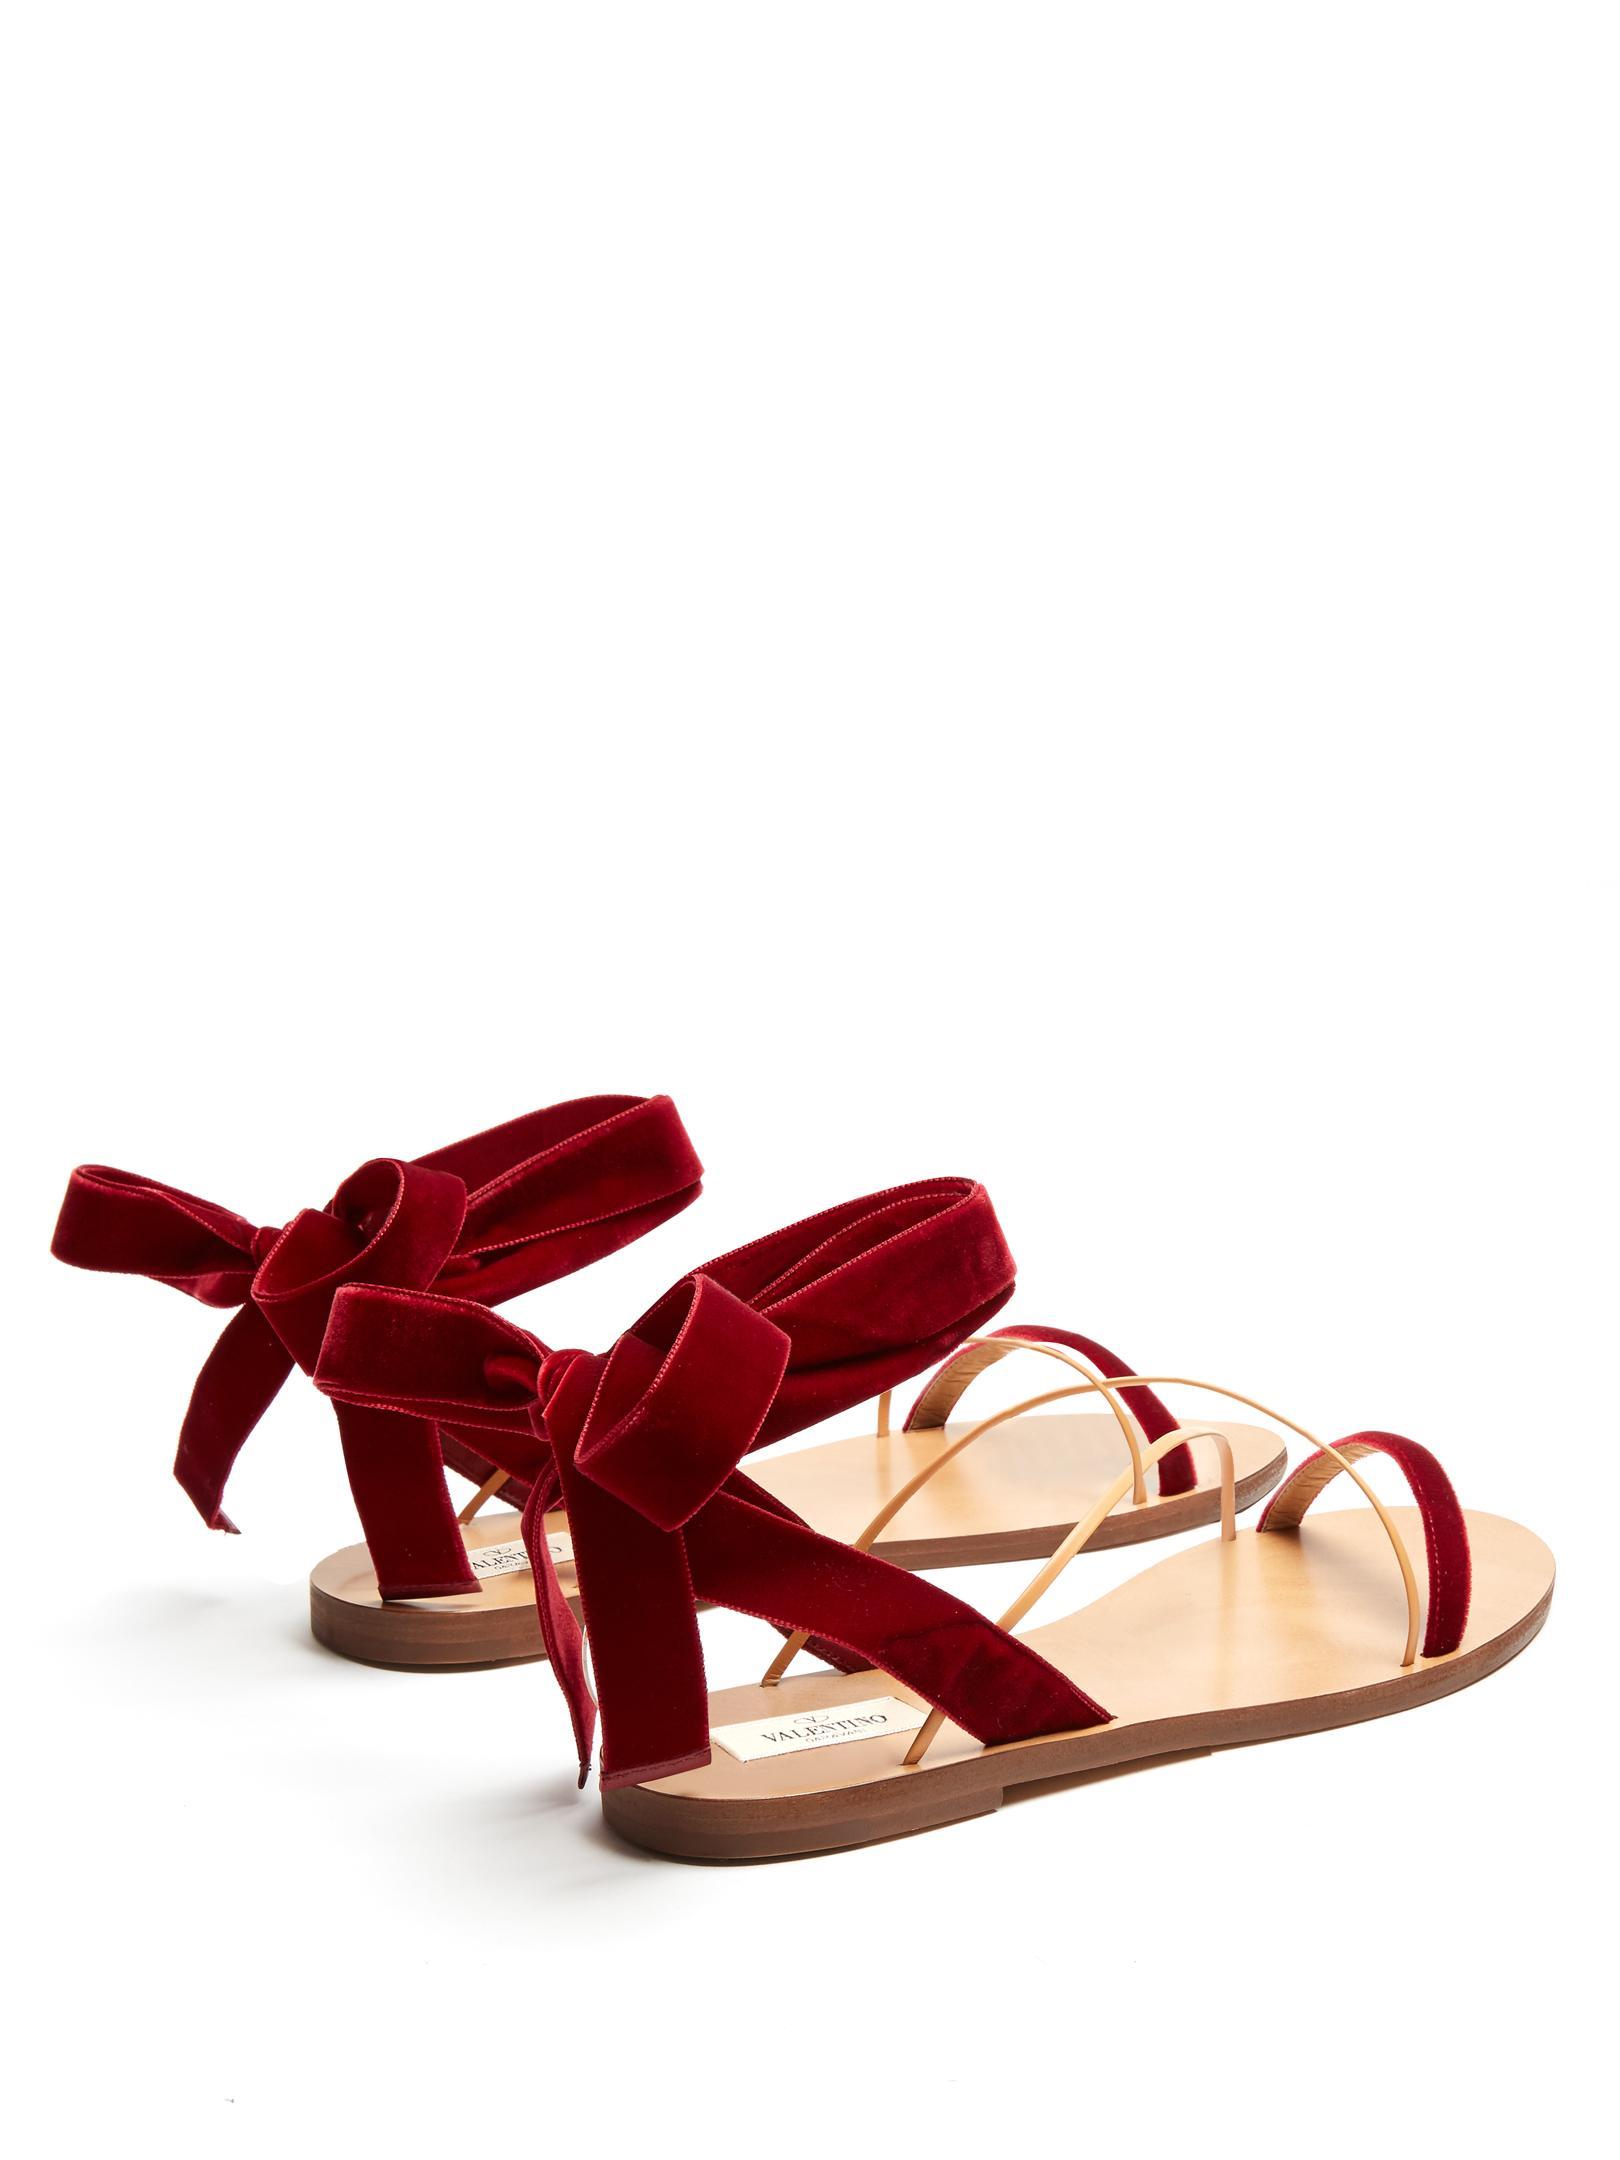 Valentino Velvet Flat Sandals In Red Lyst